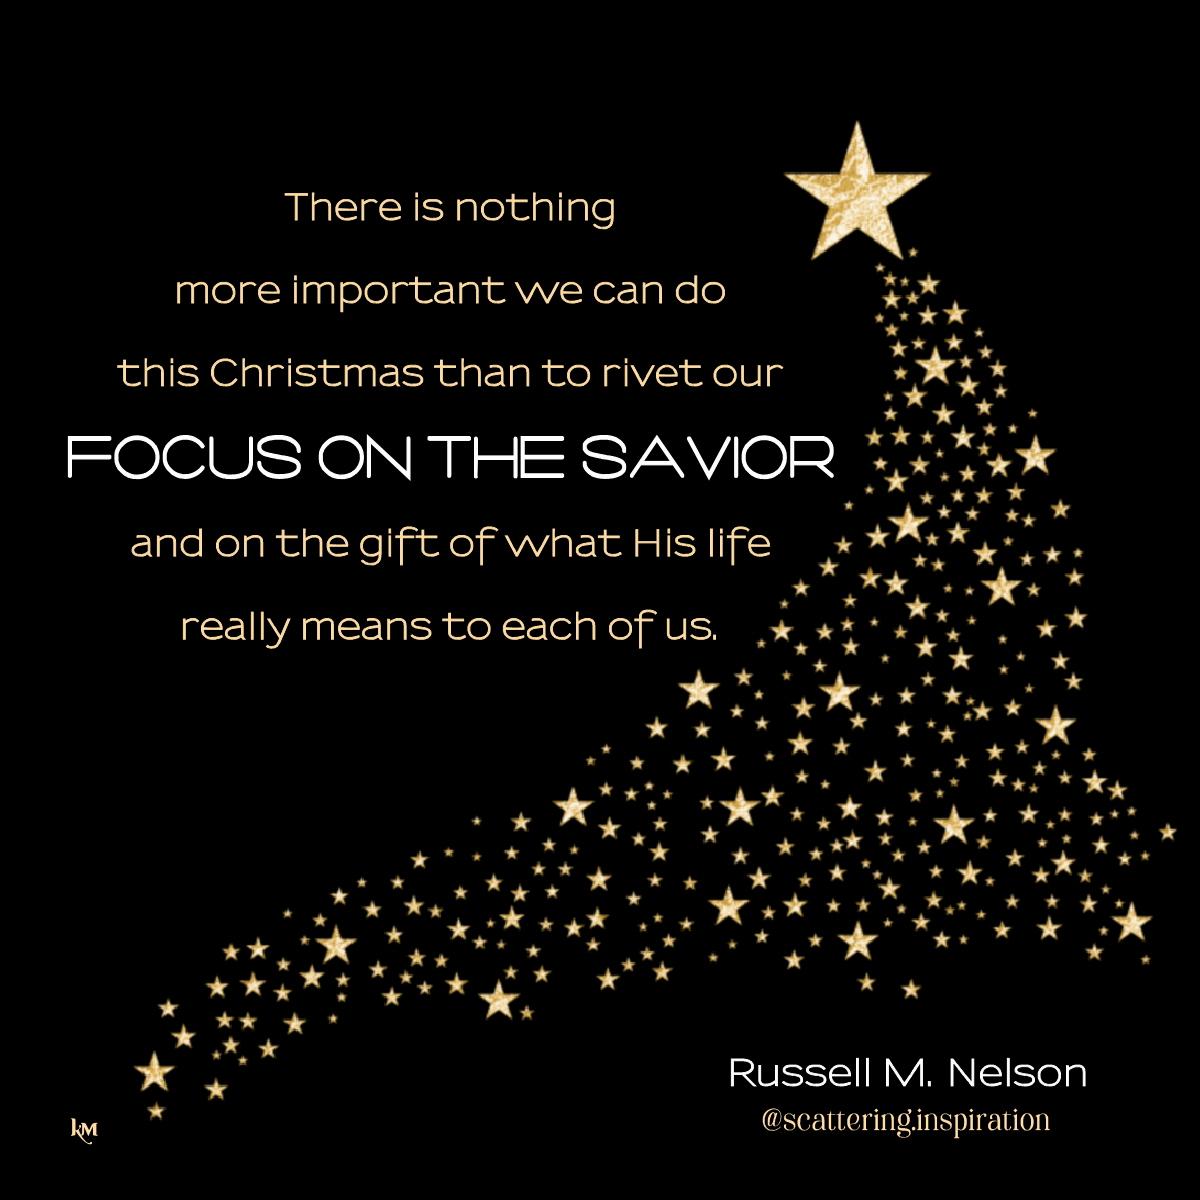 focus on the Savior